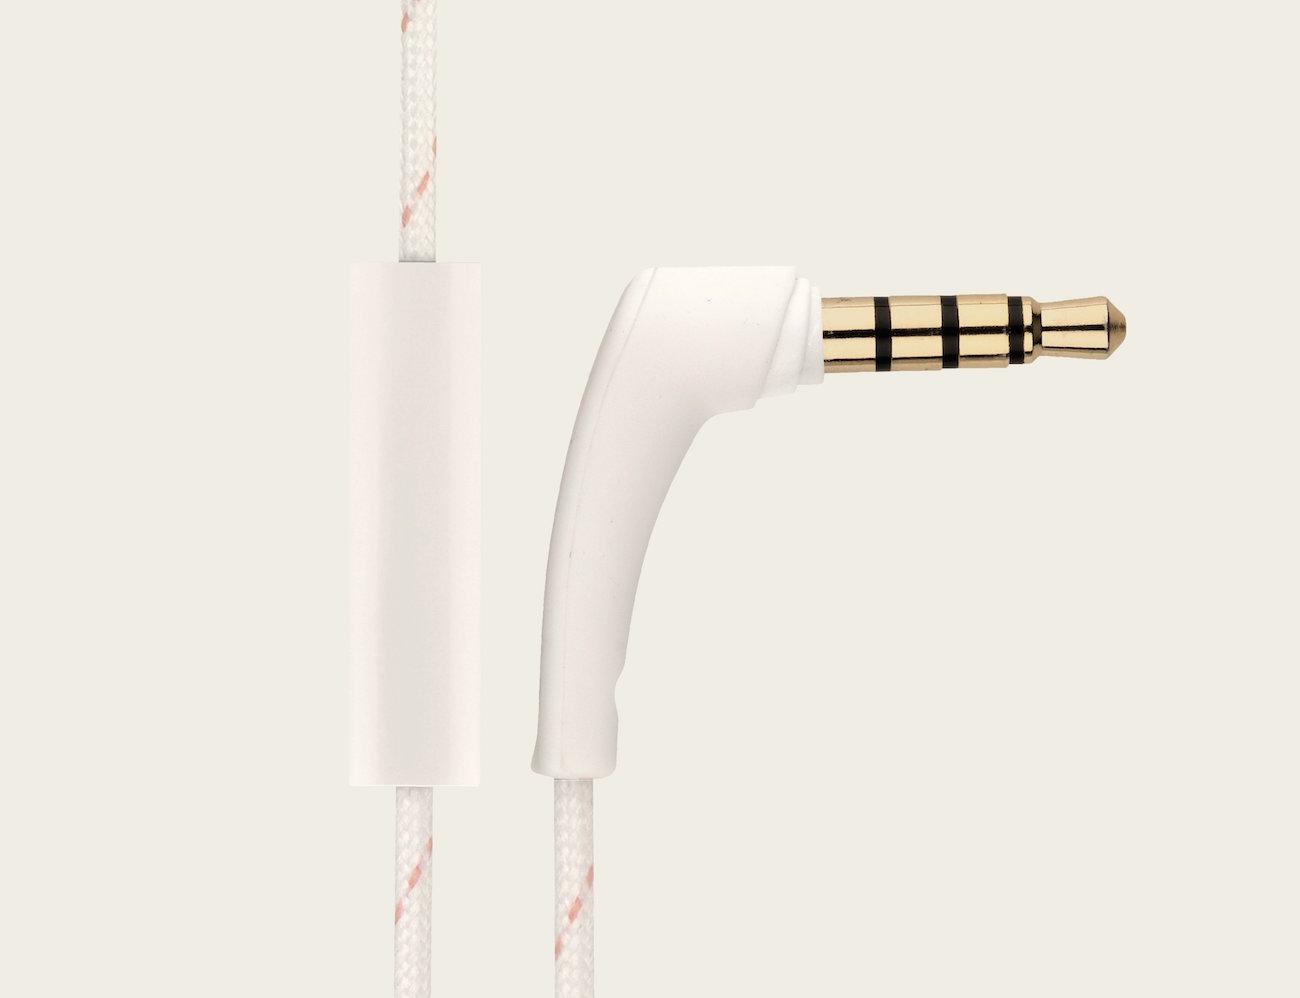 VAIN STHLM Originals Broken White Earbuds